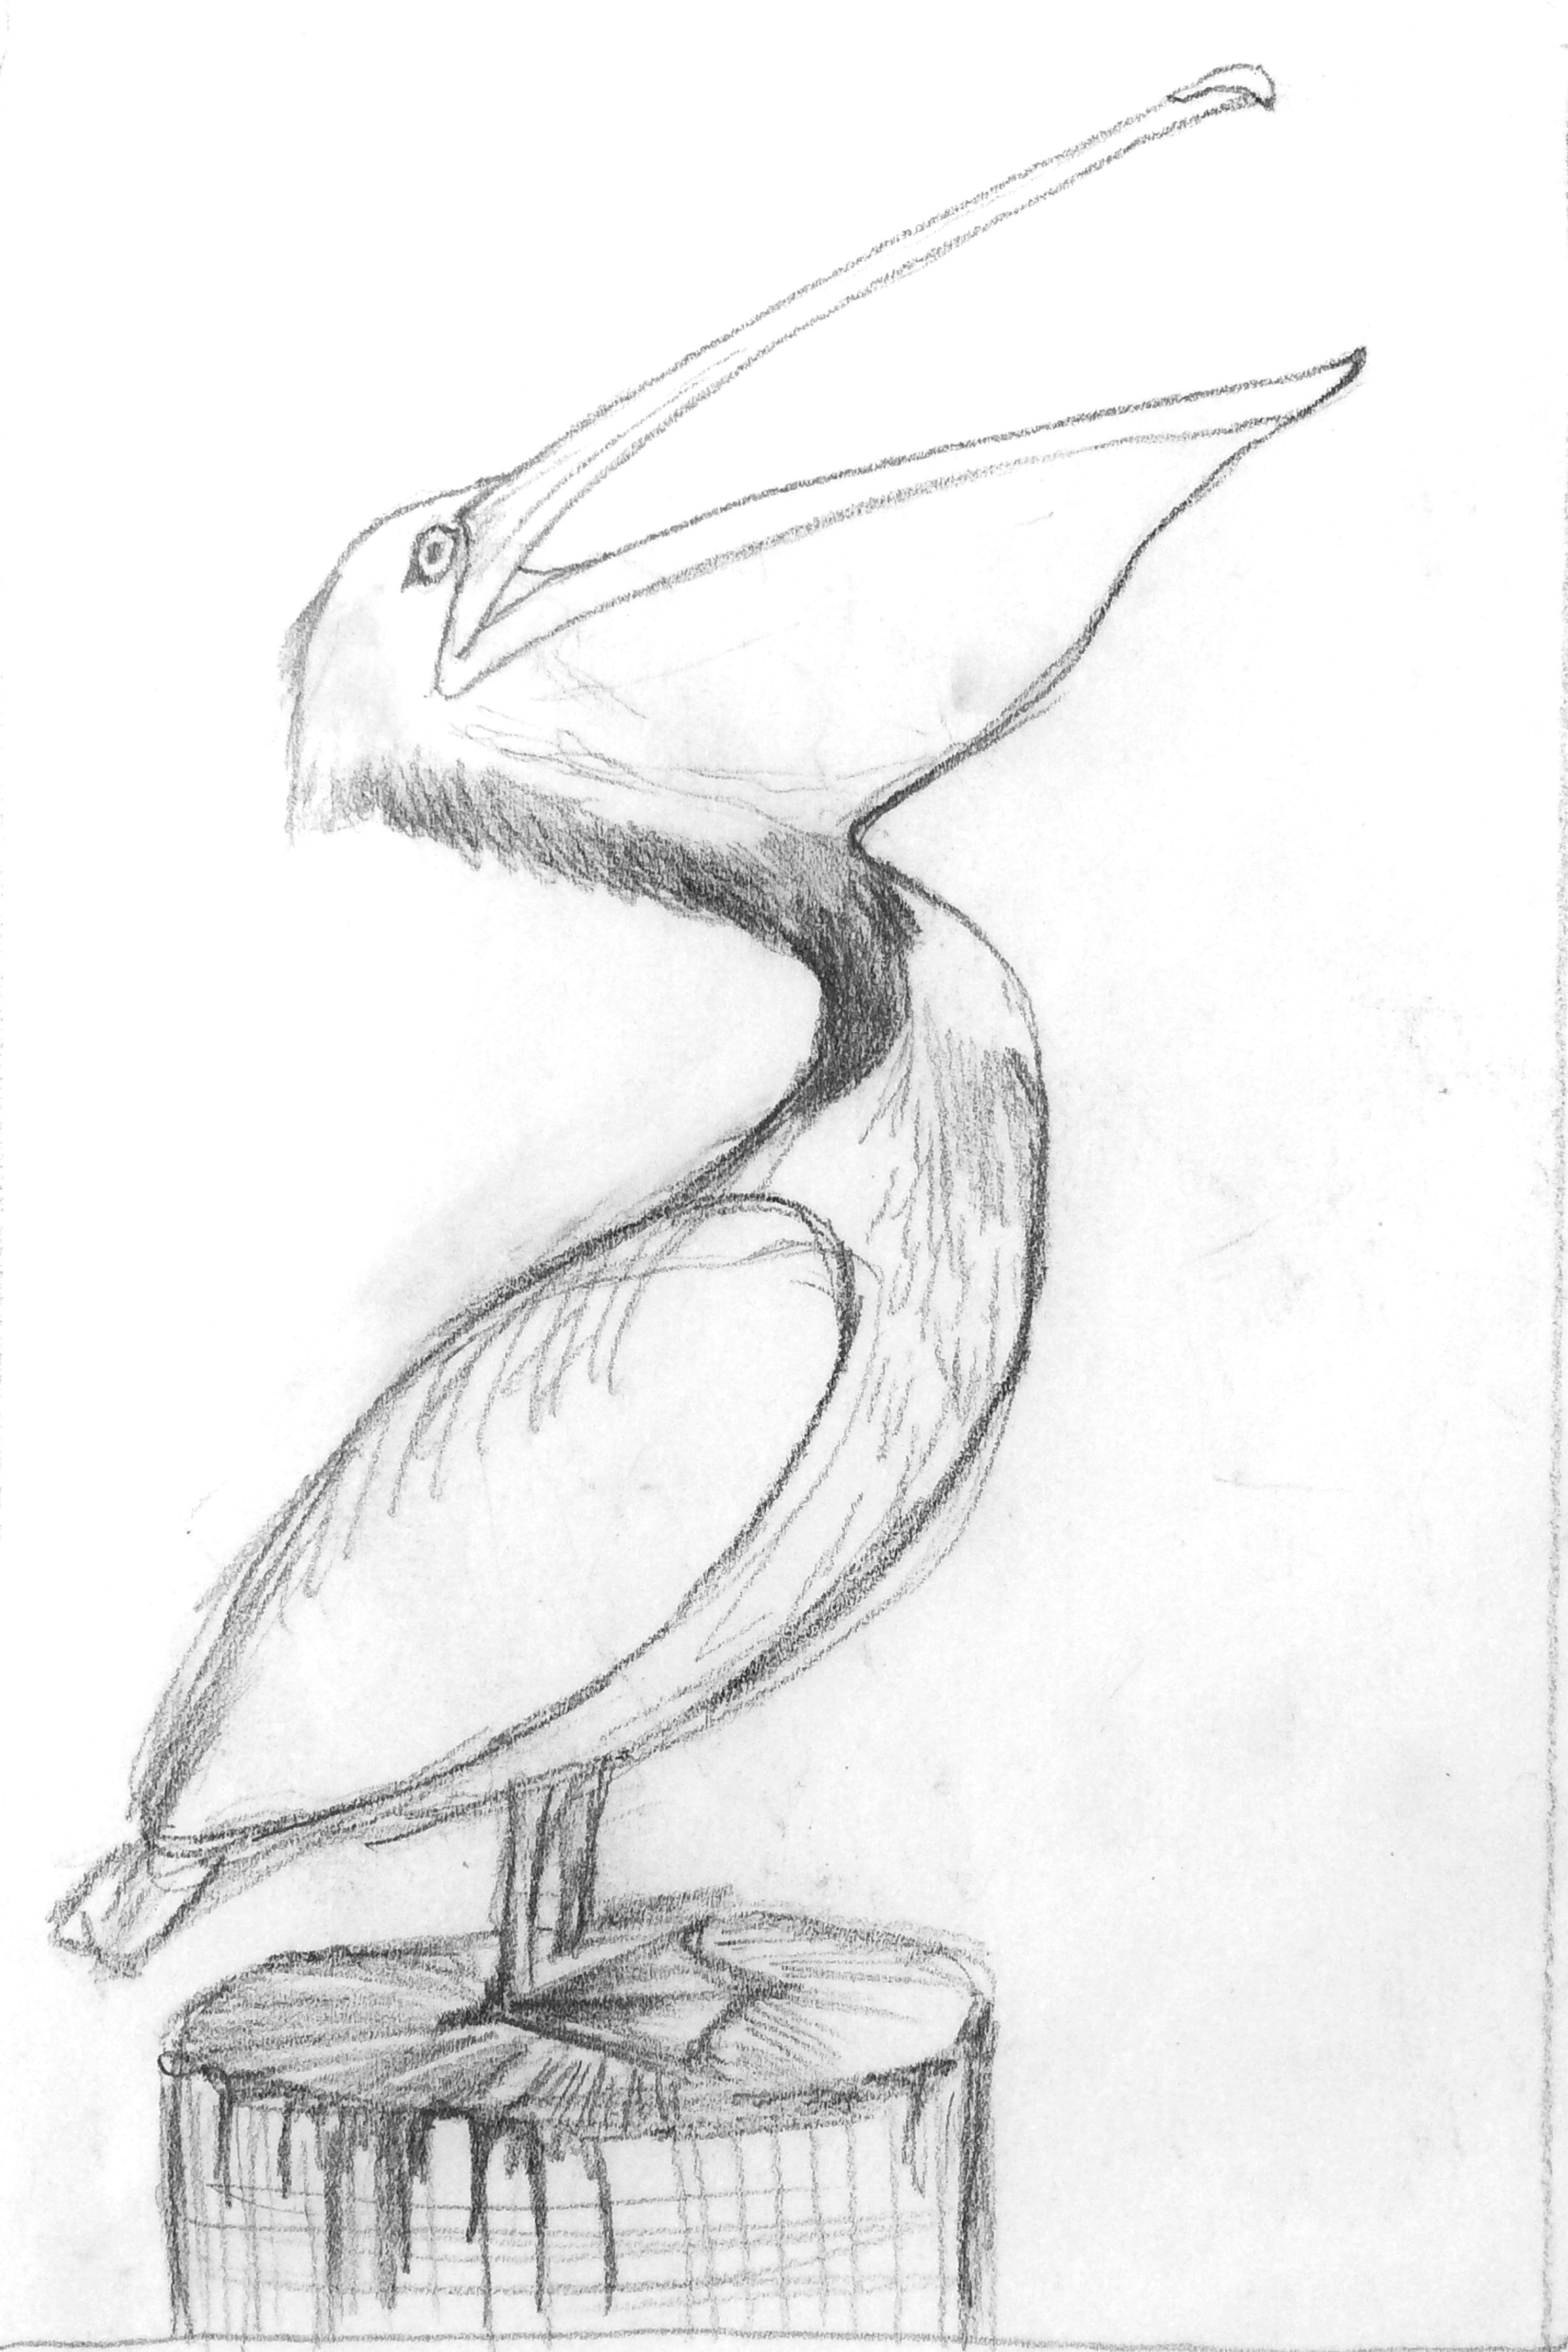 Pelican Thumbnail sketch- MLighthipe©2014